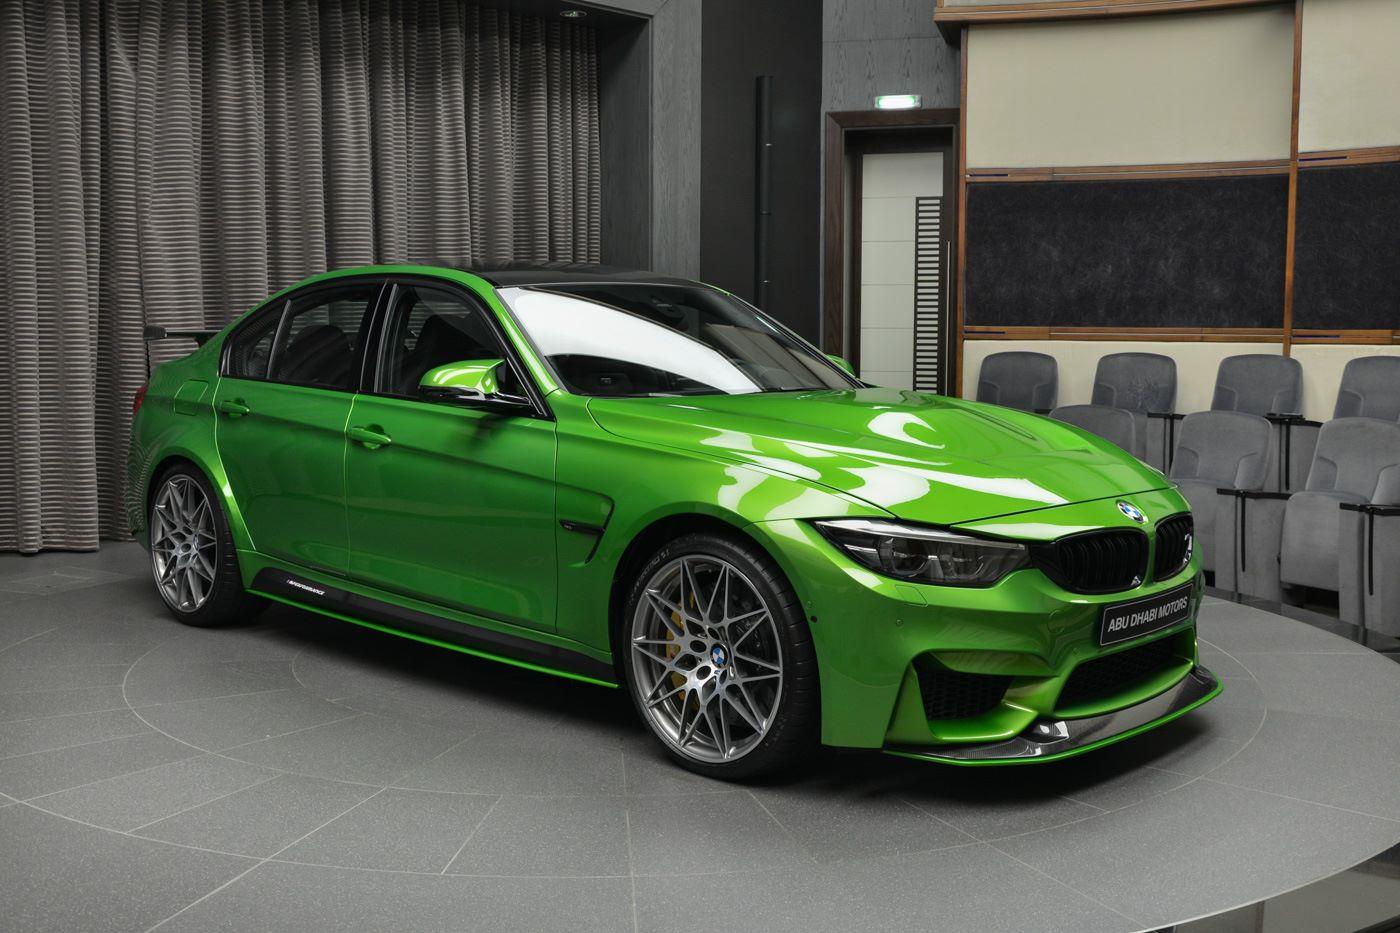 BMW_M3_Java_Green_05